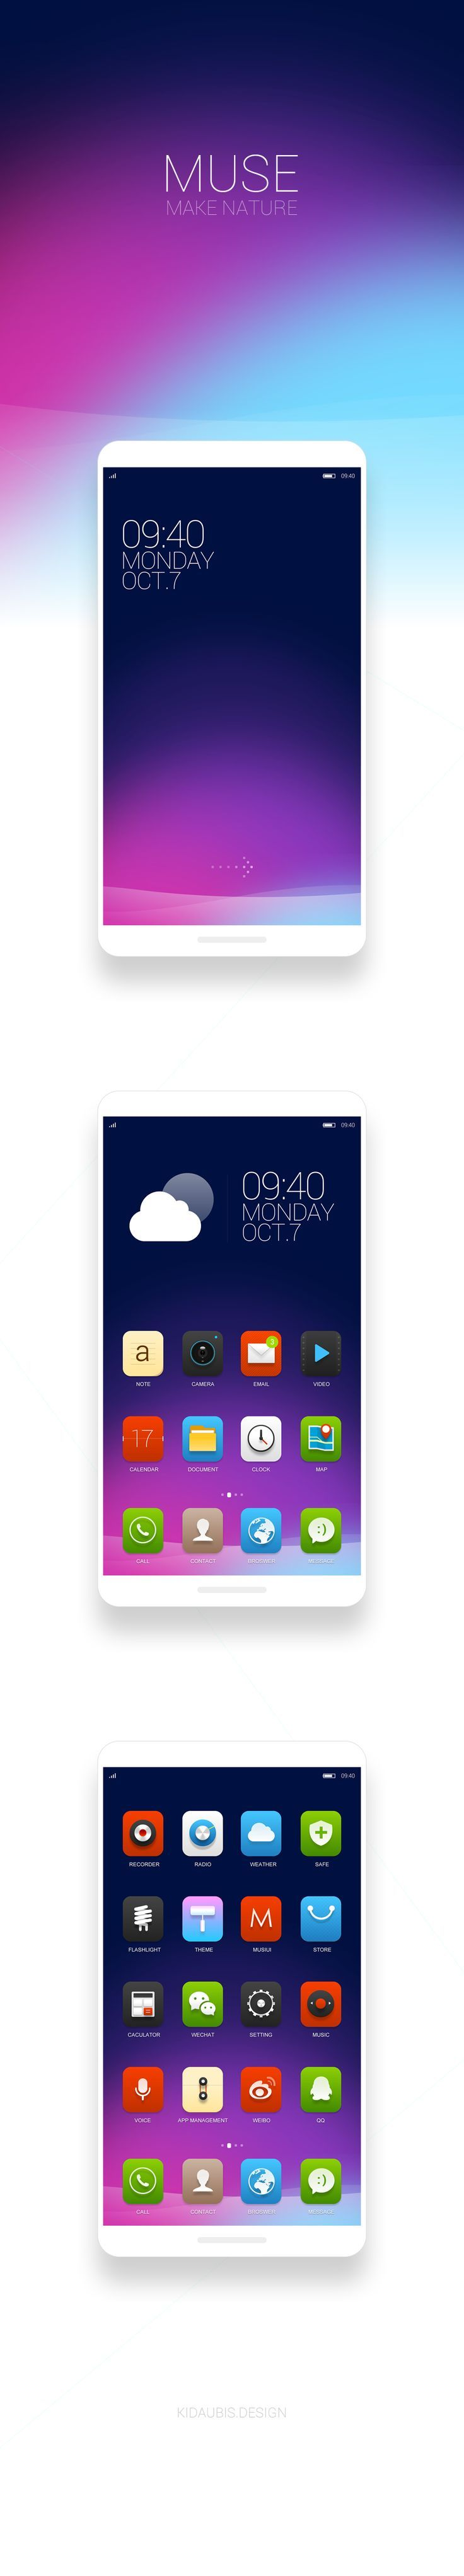 More Muse UI Design #mobile #ui #design pinterest.com/alextcsung/